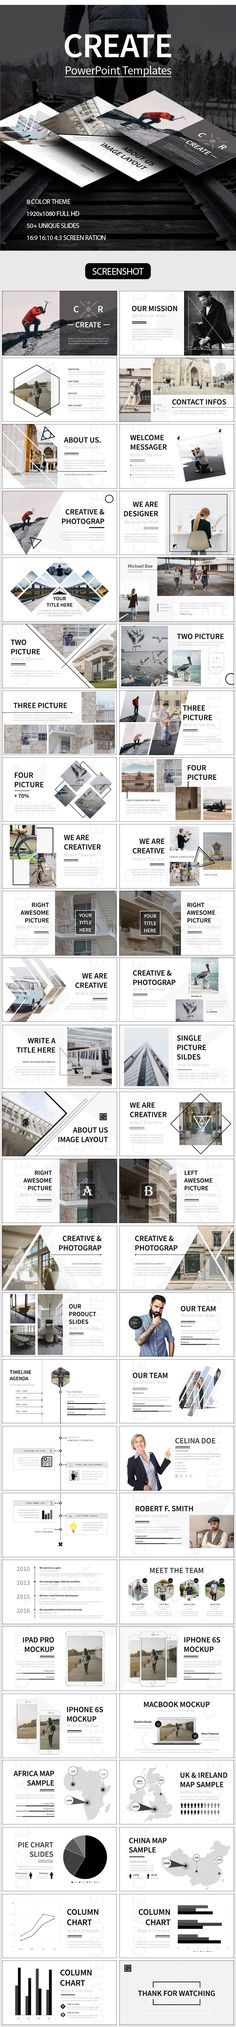 CREATE Powerpoint Template - Creative PowerPoint Templates